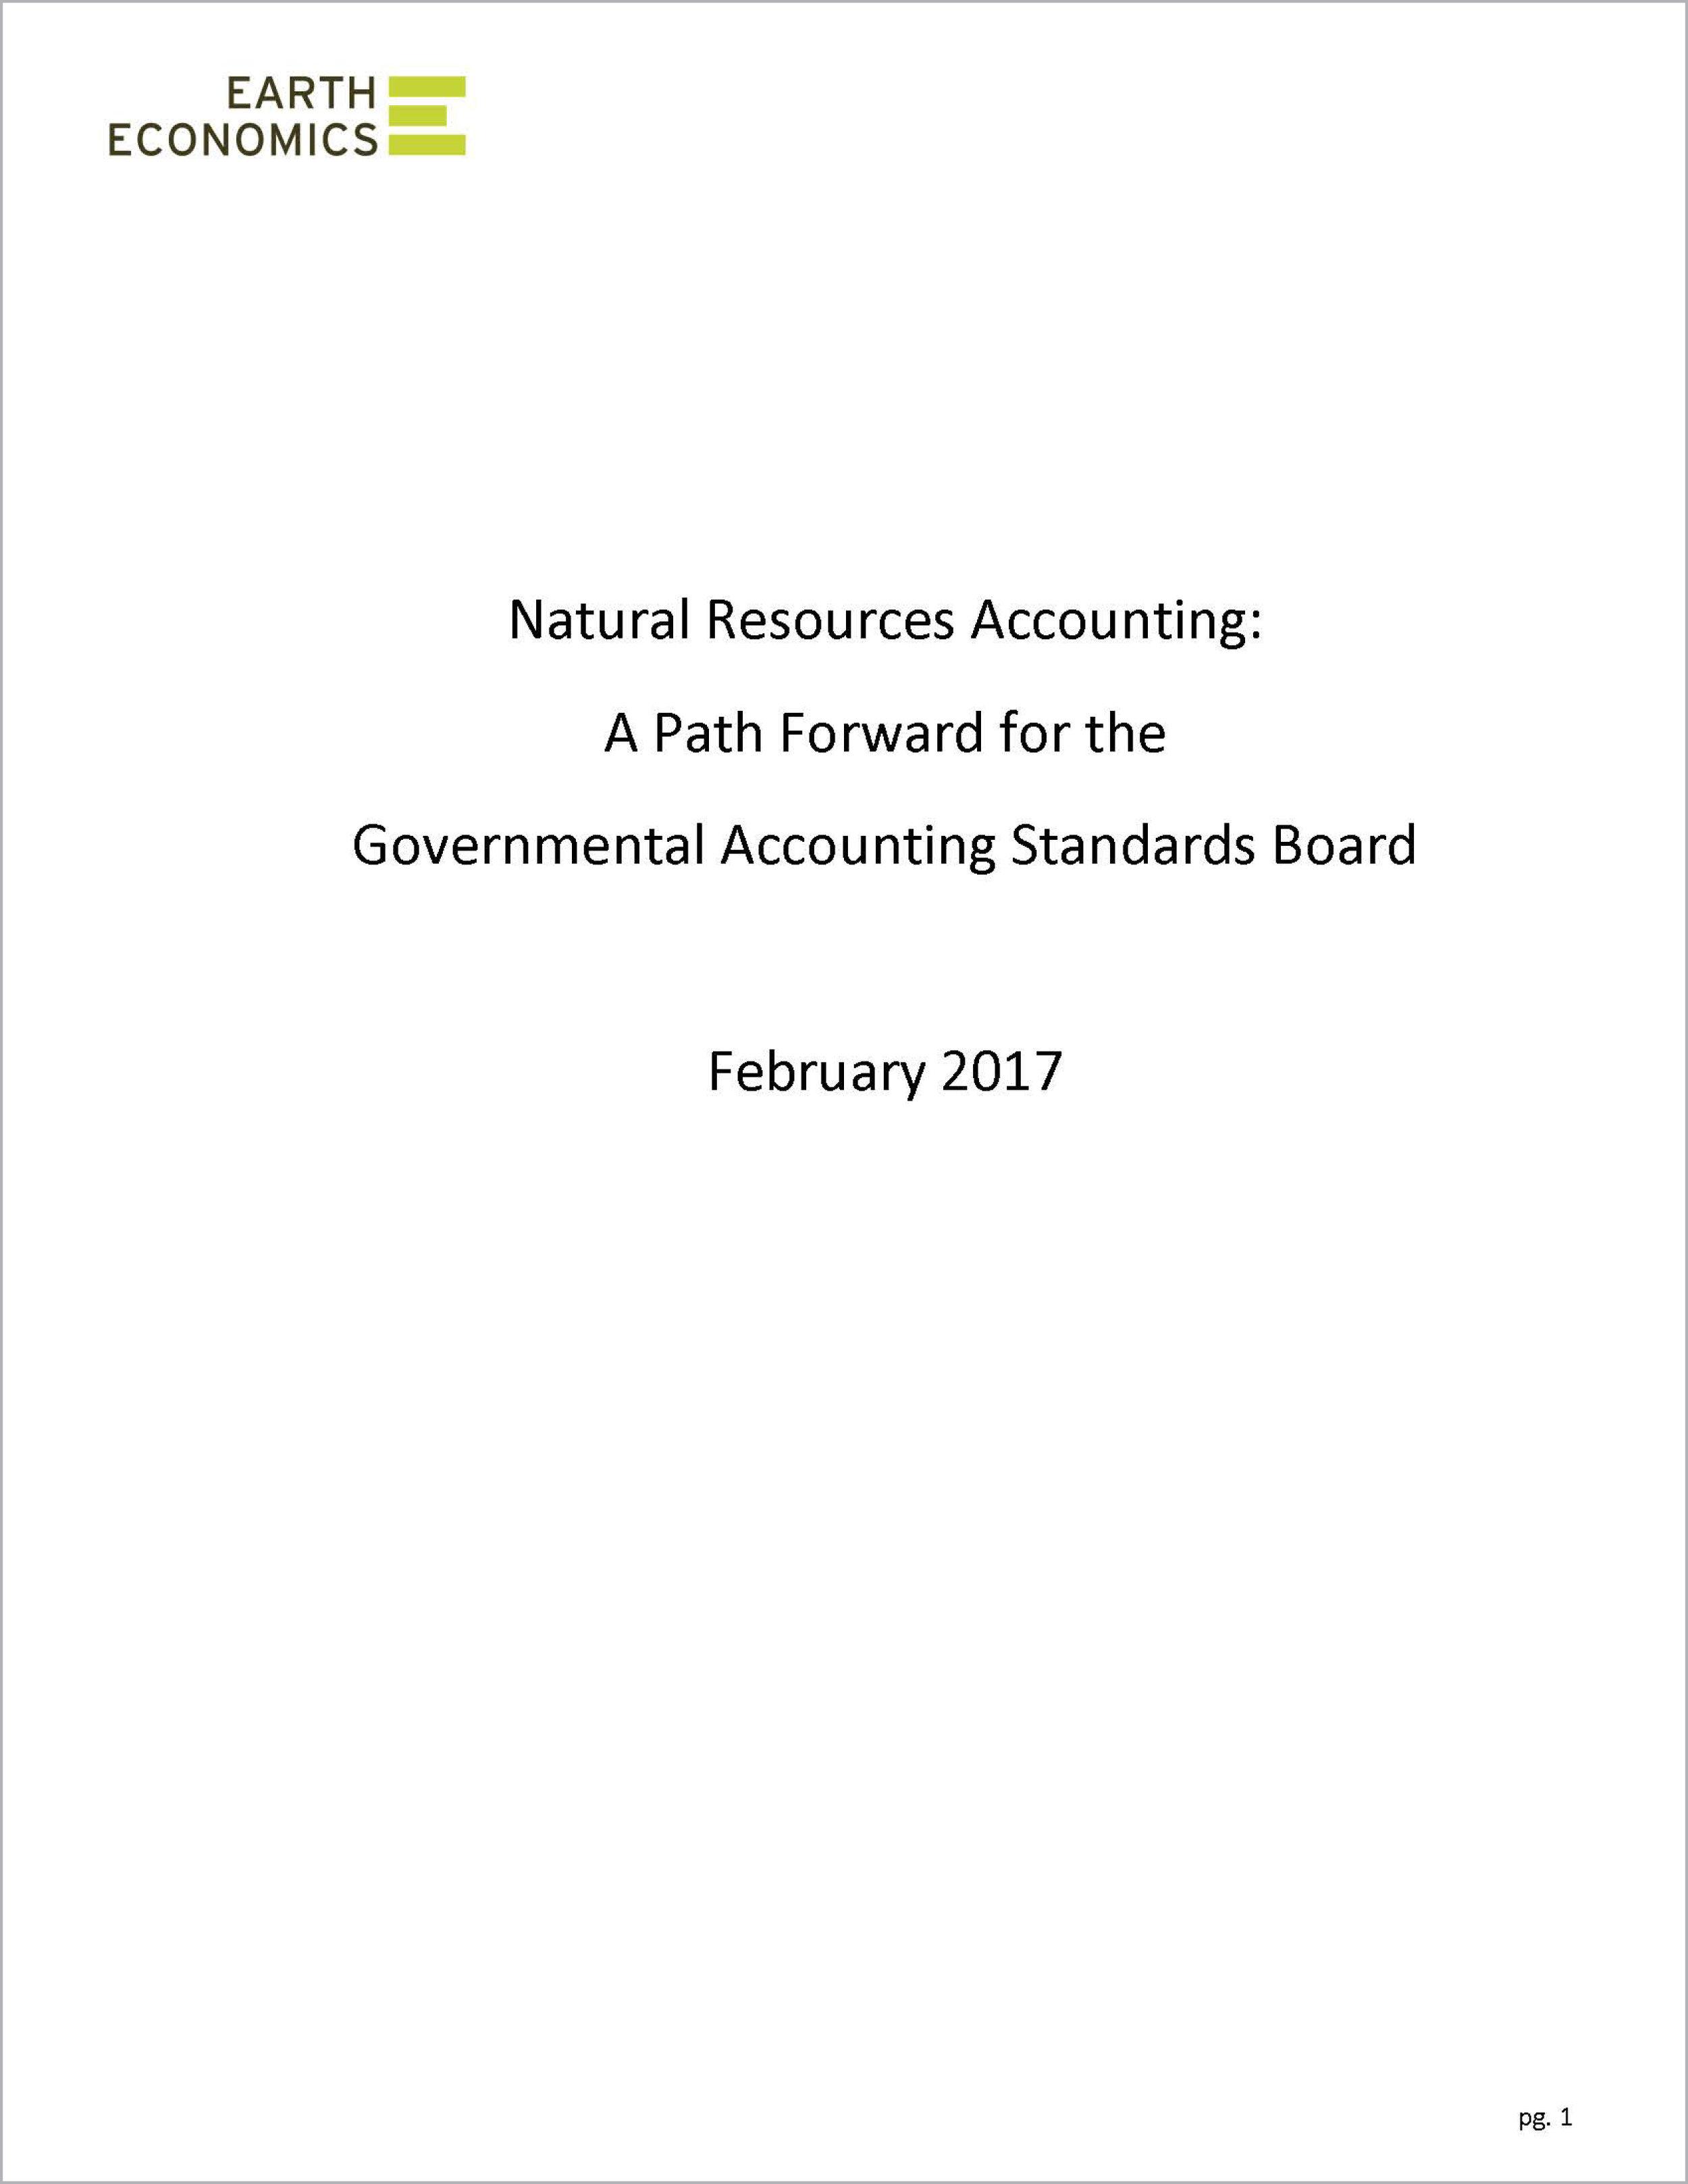 Cover_NaturalResourcesAccounting_EarthEconomics_Feb2017.jpg